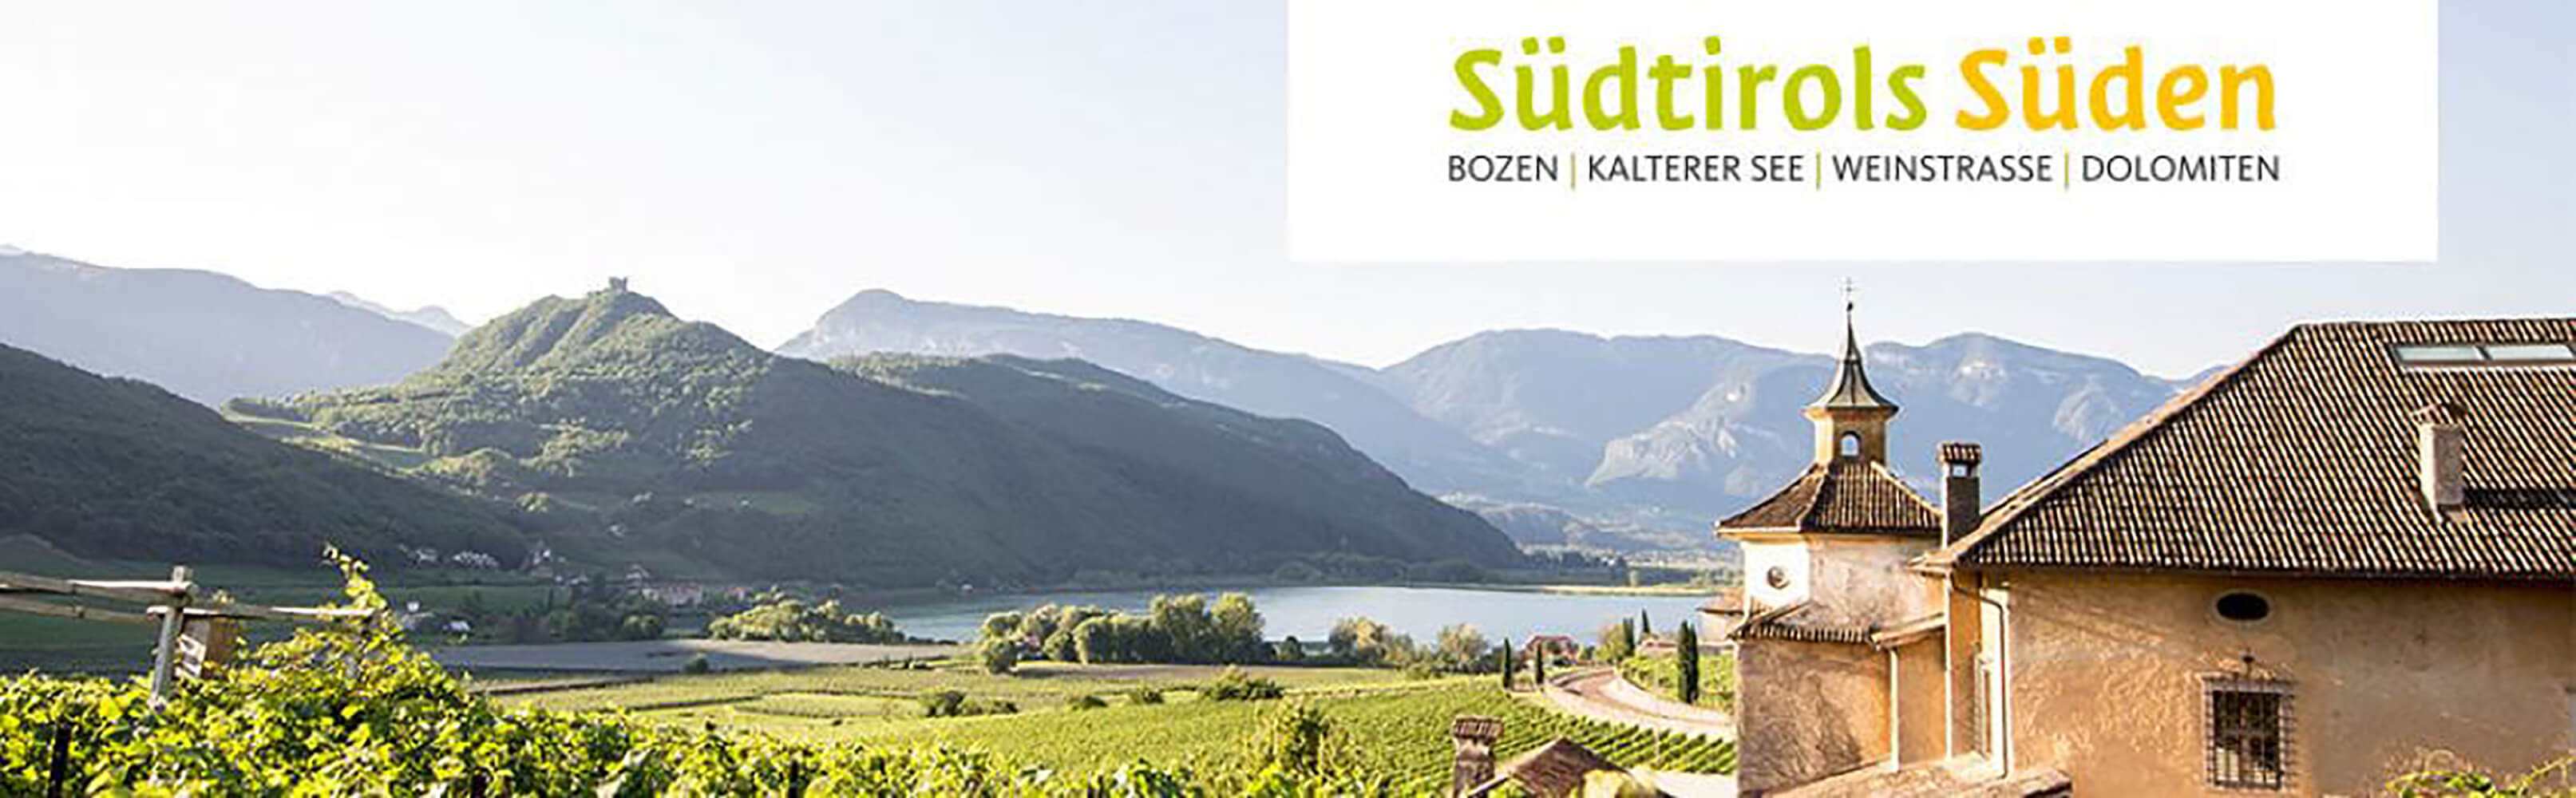 Südtirols Süden - Dolce Vita pur! 1